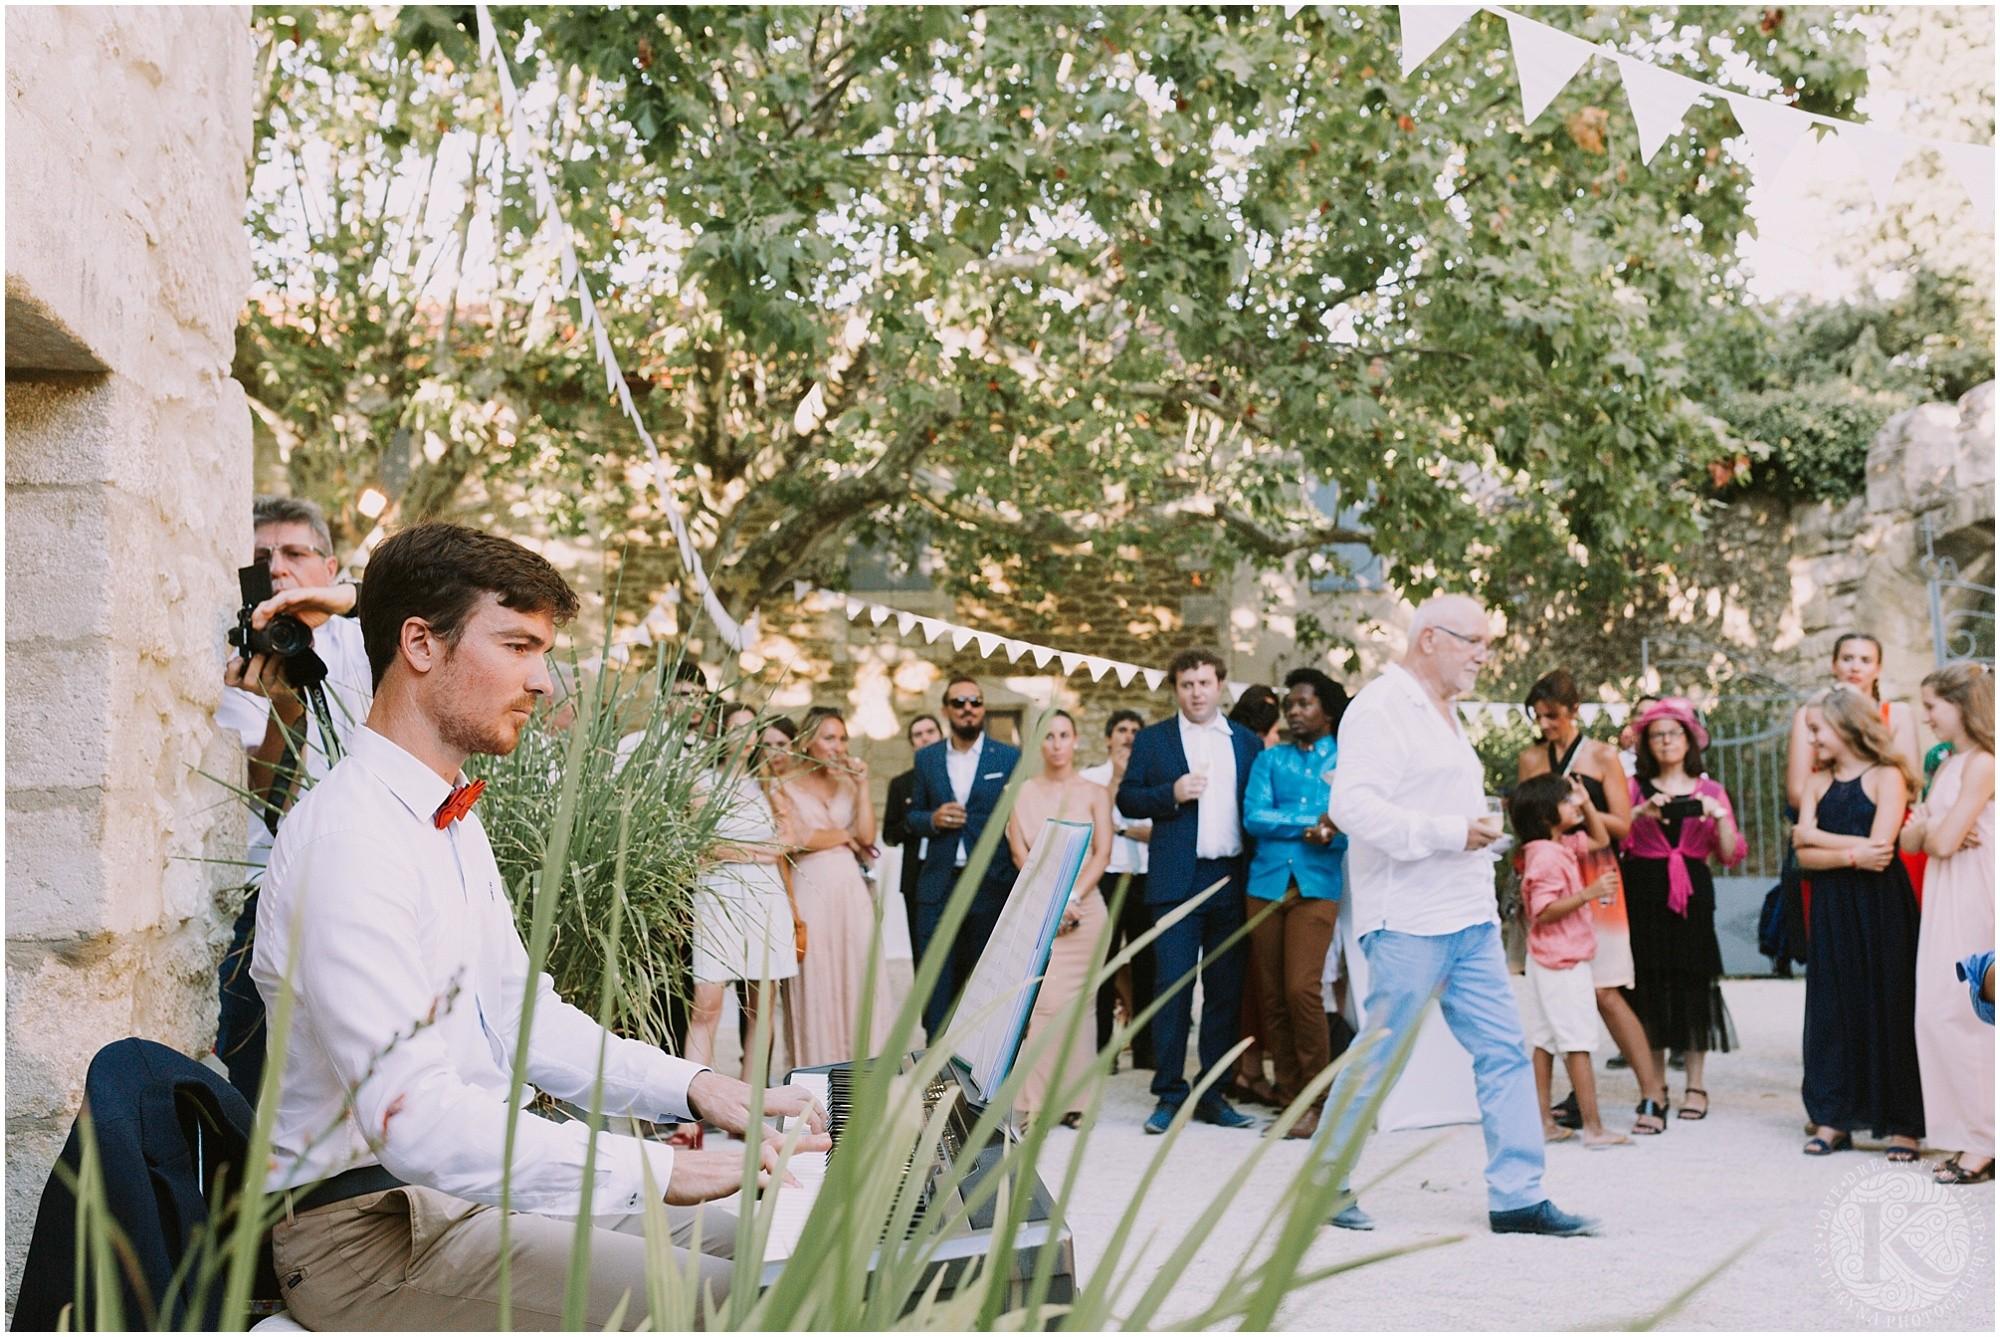 Kateryna-photos-photographe-mariage-vaucluse-provence-avignon-ferme-st-hugues_0067.jpg